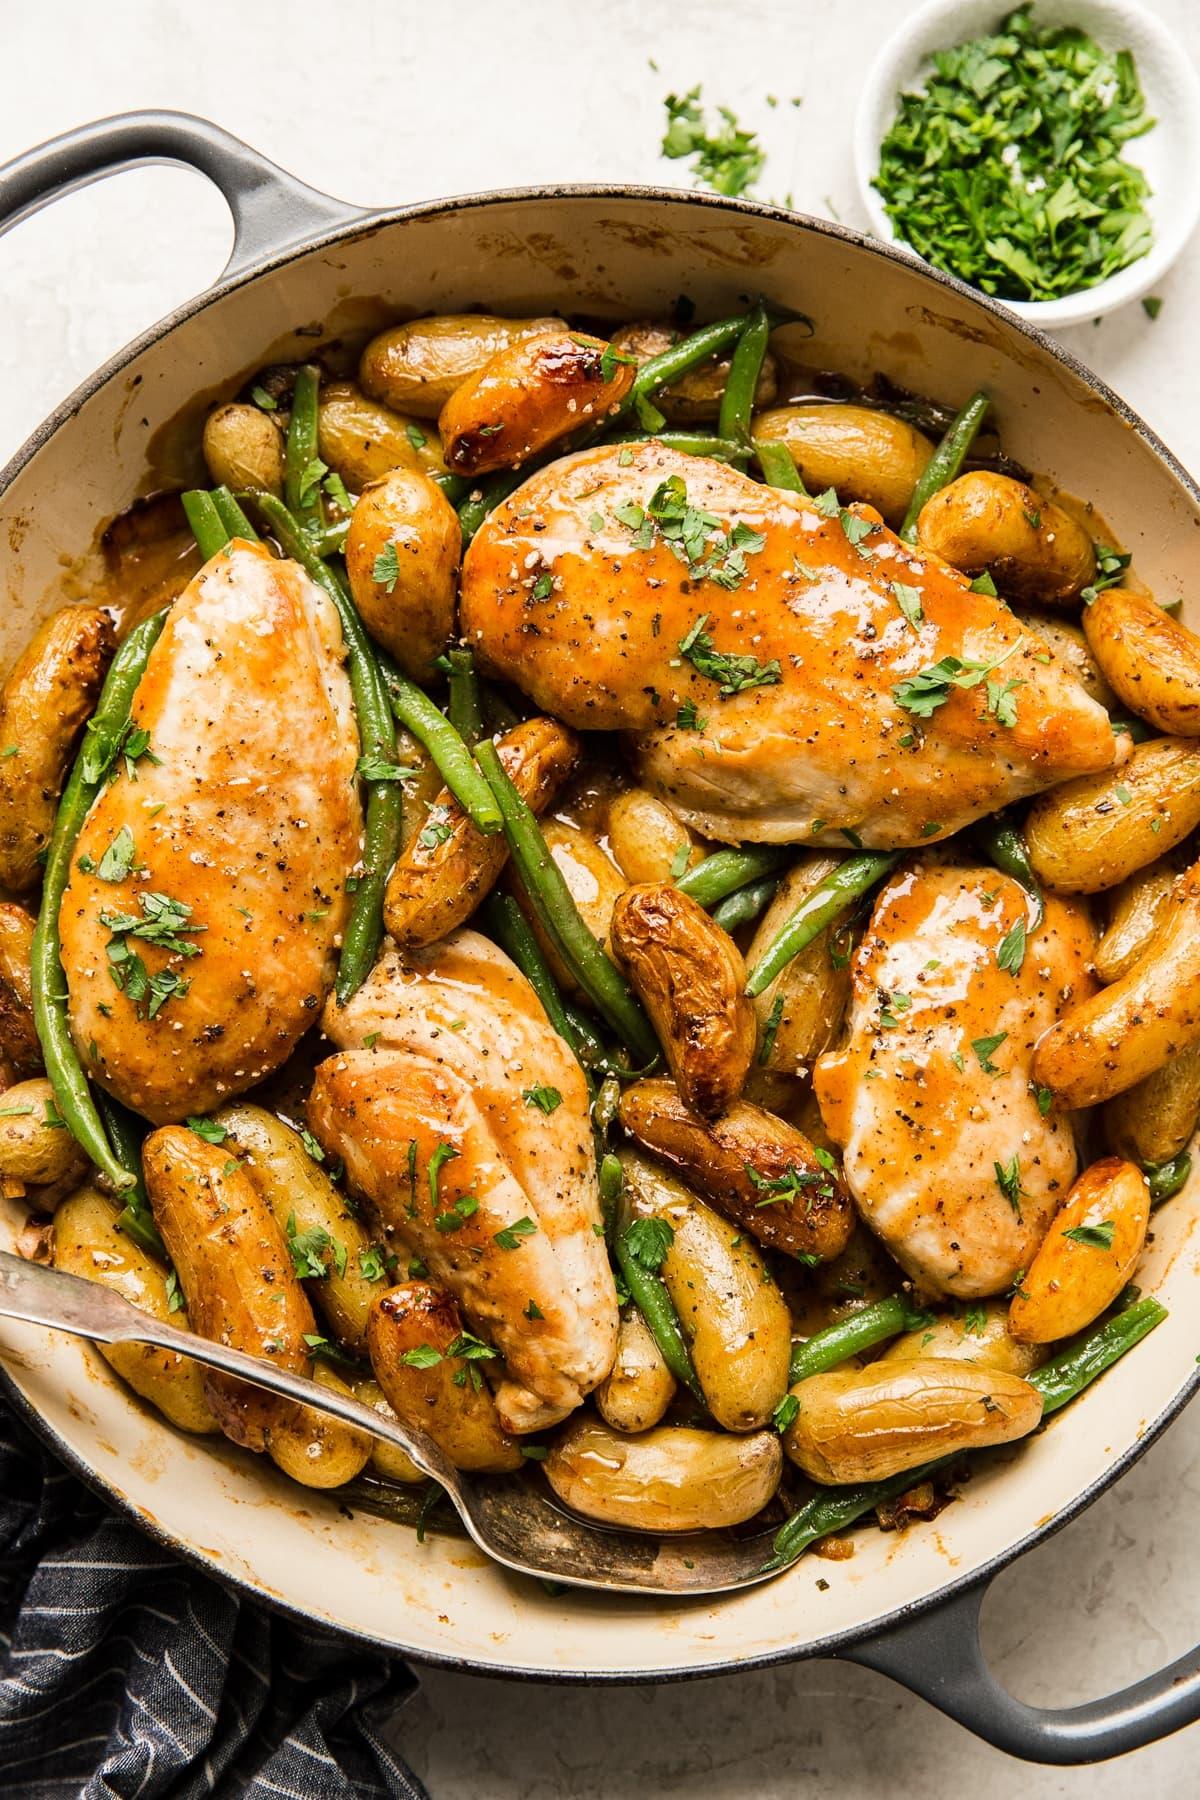 30 Best Potato Recipes The Modern Proper